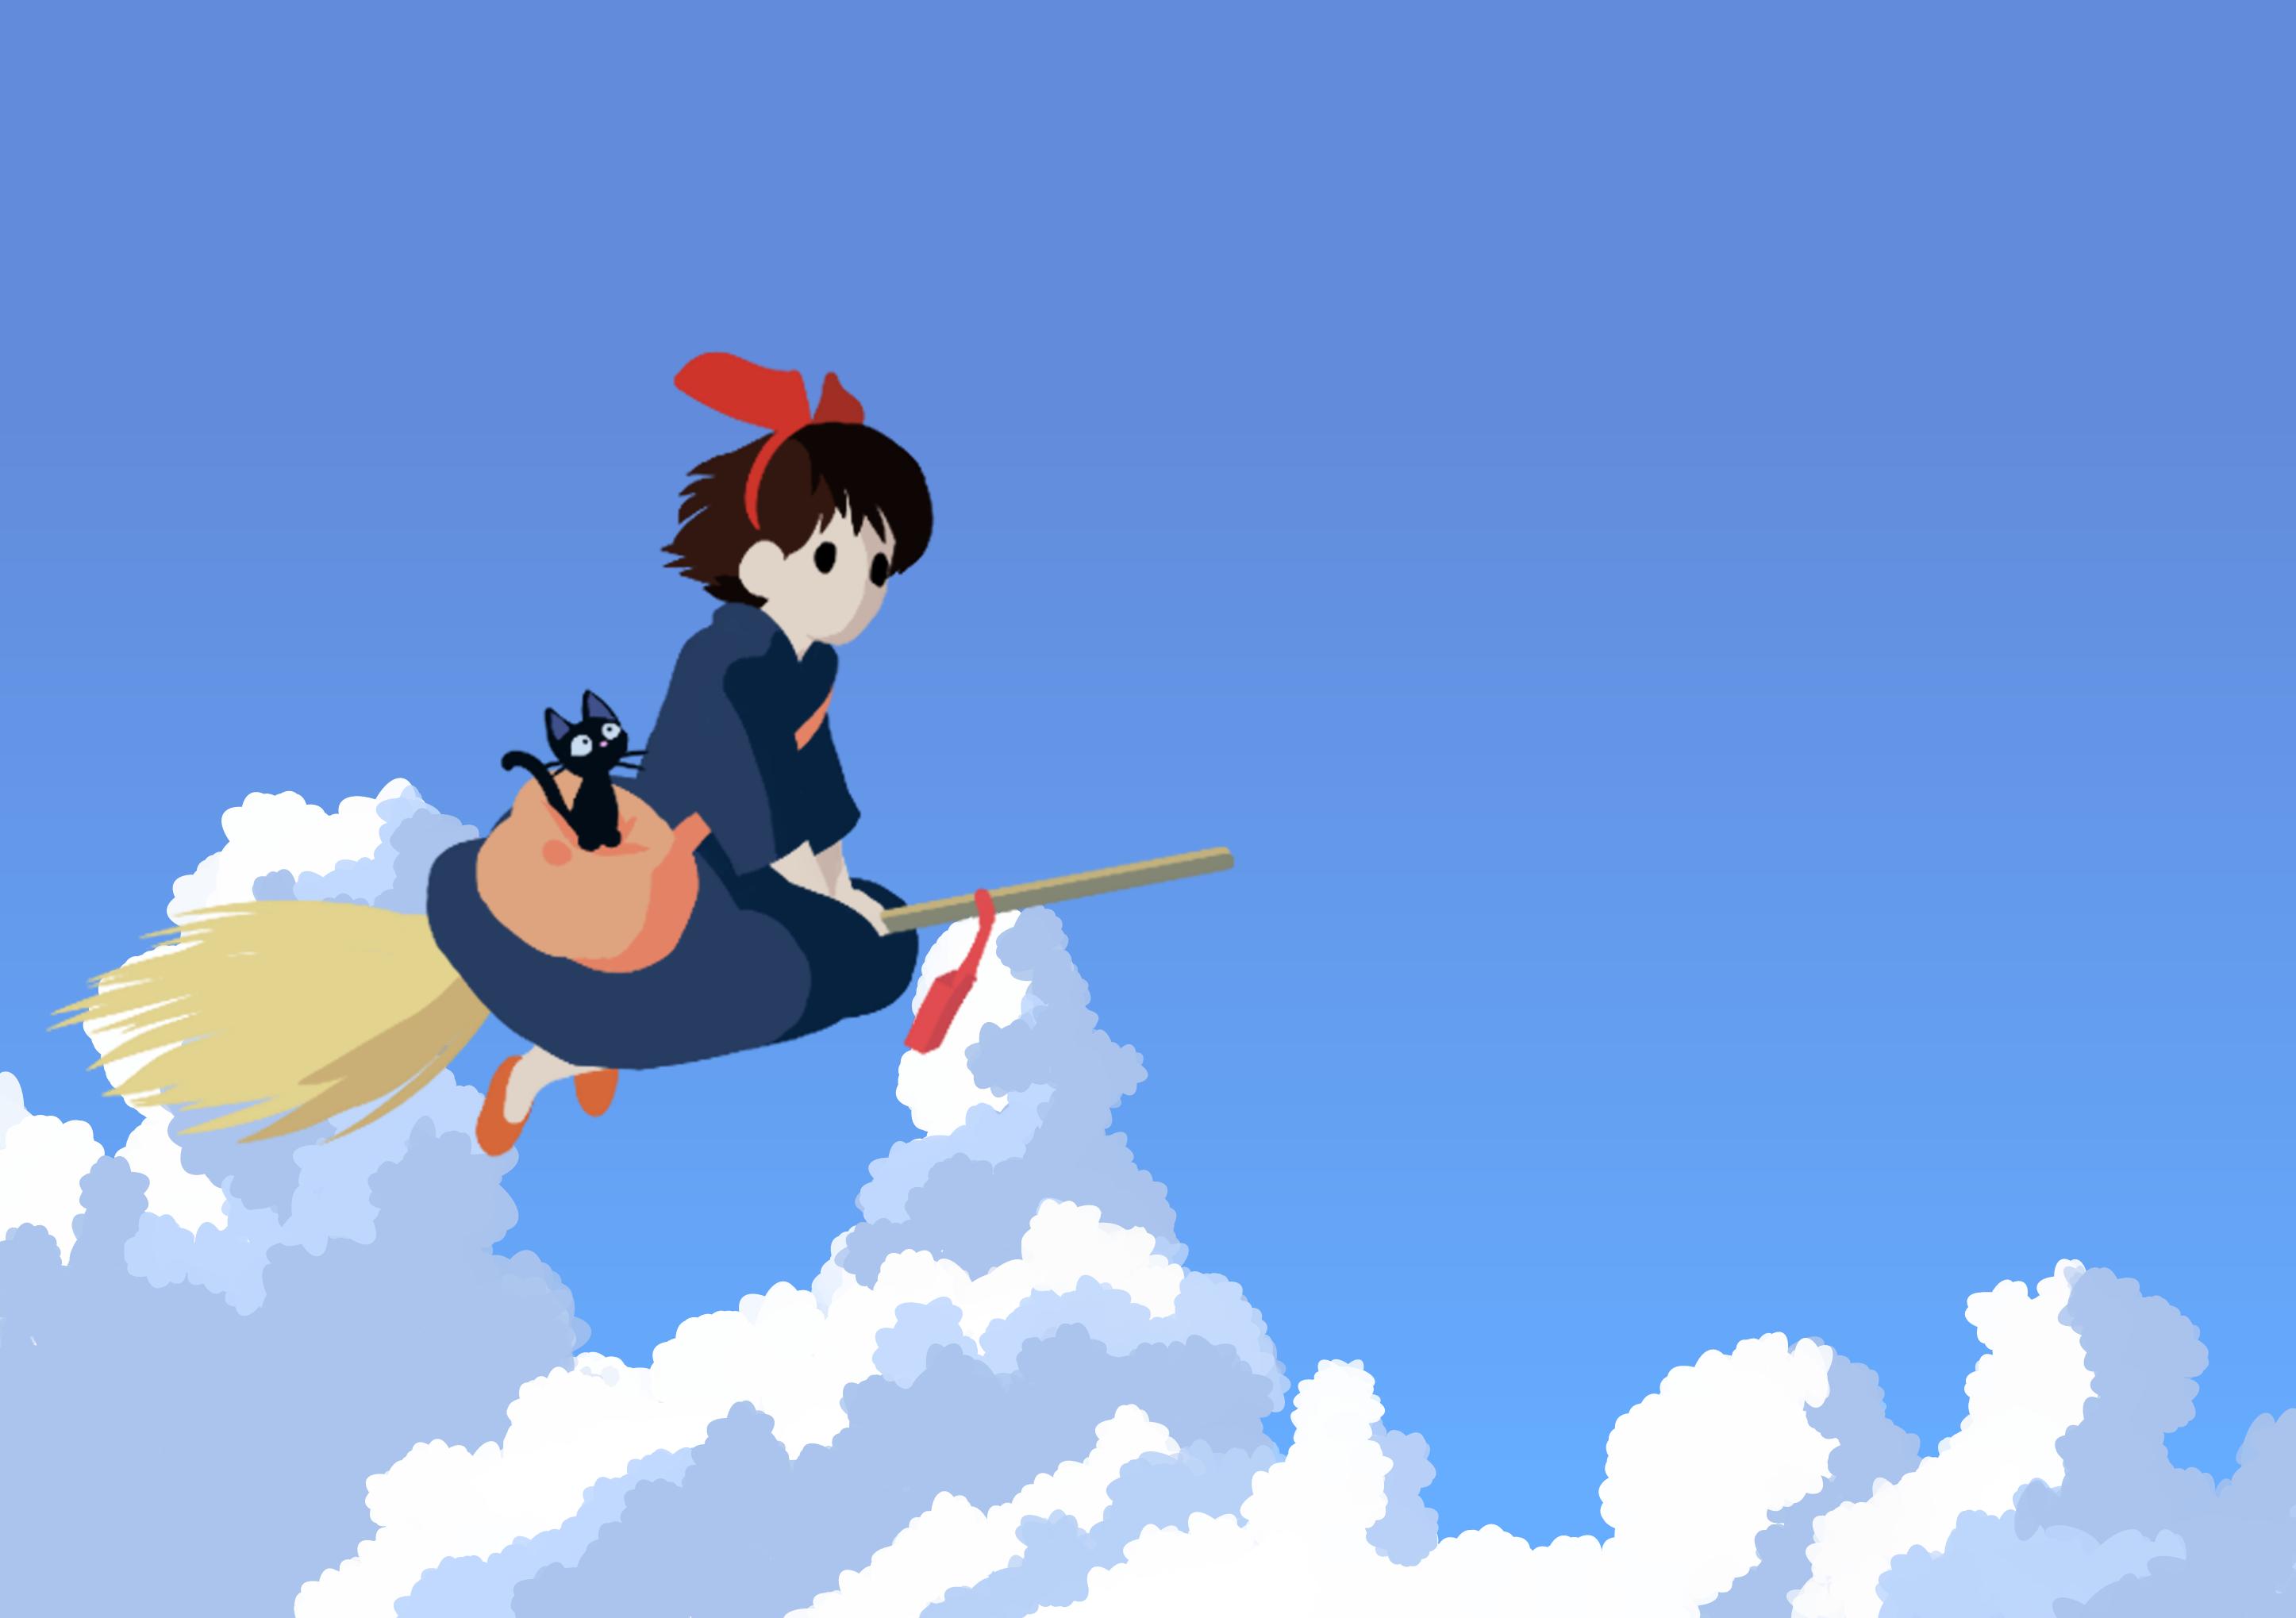 Ghibli Wallpaper Kiki S Delivery Service By Fandidit On Deviantart